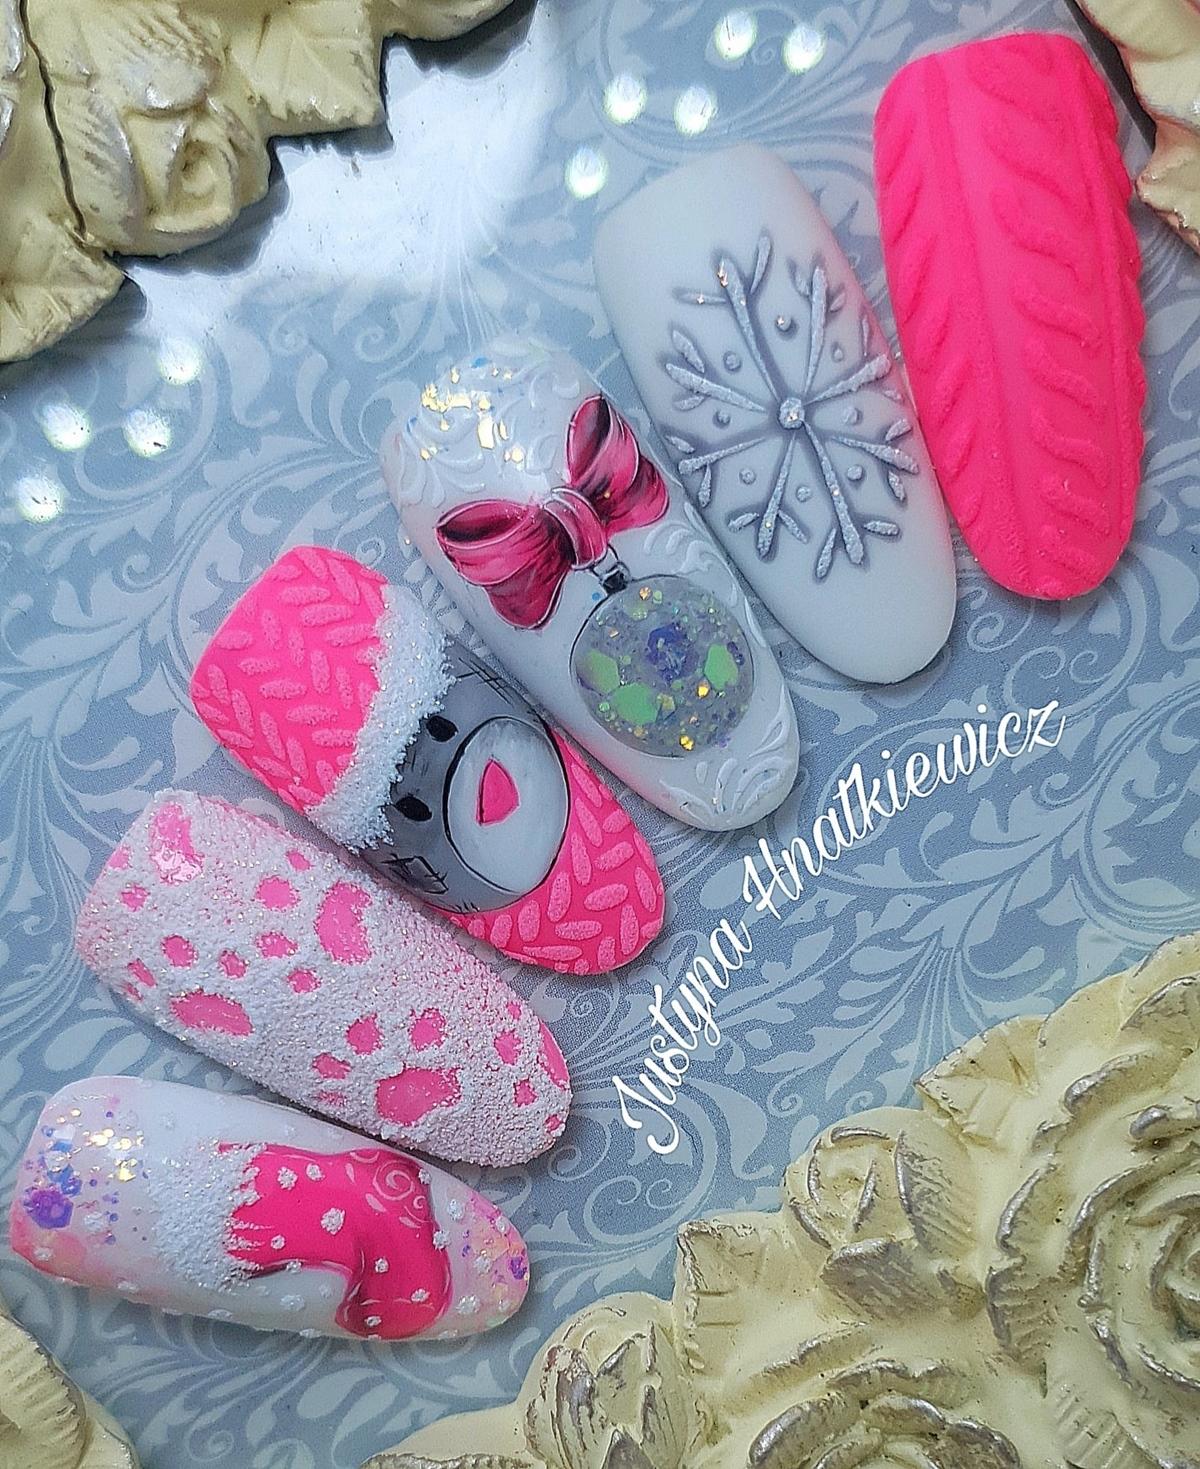 sweterek na paznokciach hybrydowych